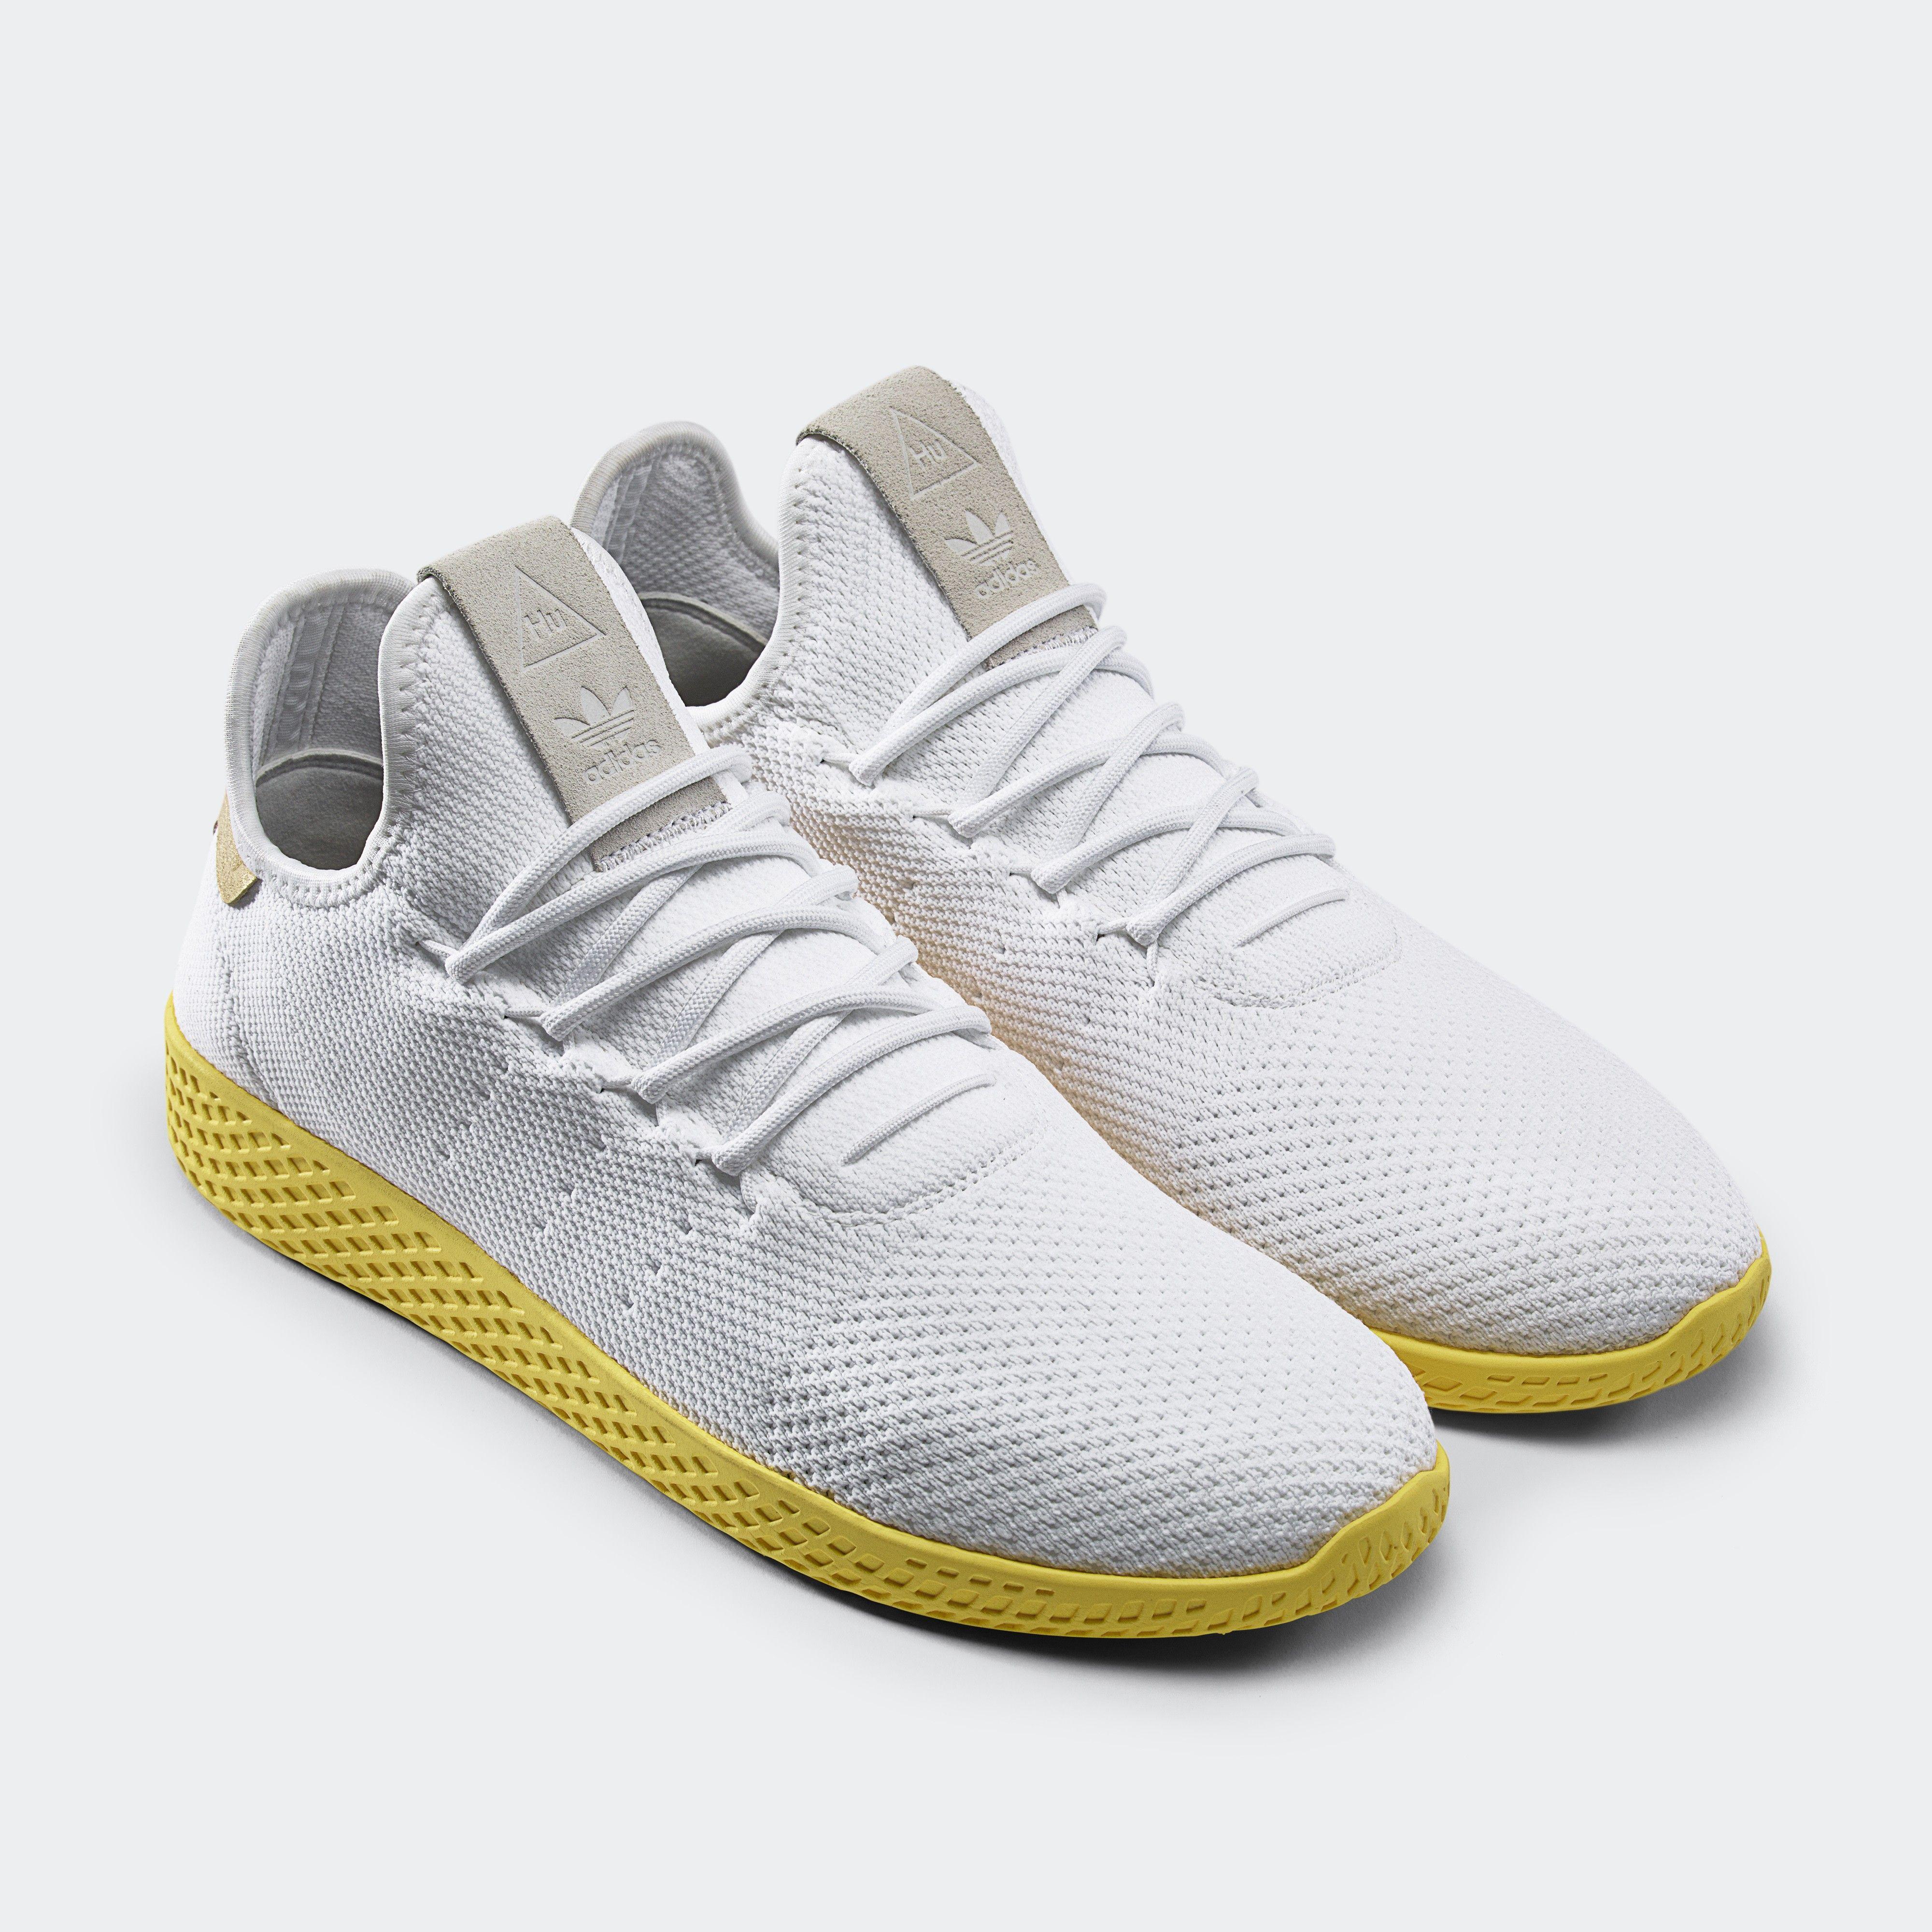 1ce23a767ea Minimalismo marca novos modelos adidas Originals x Pharrell